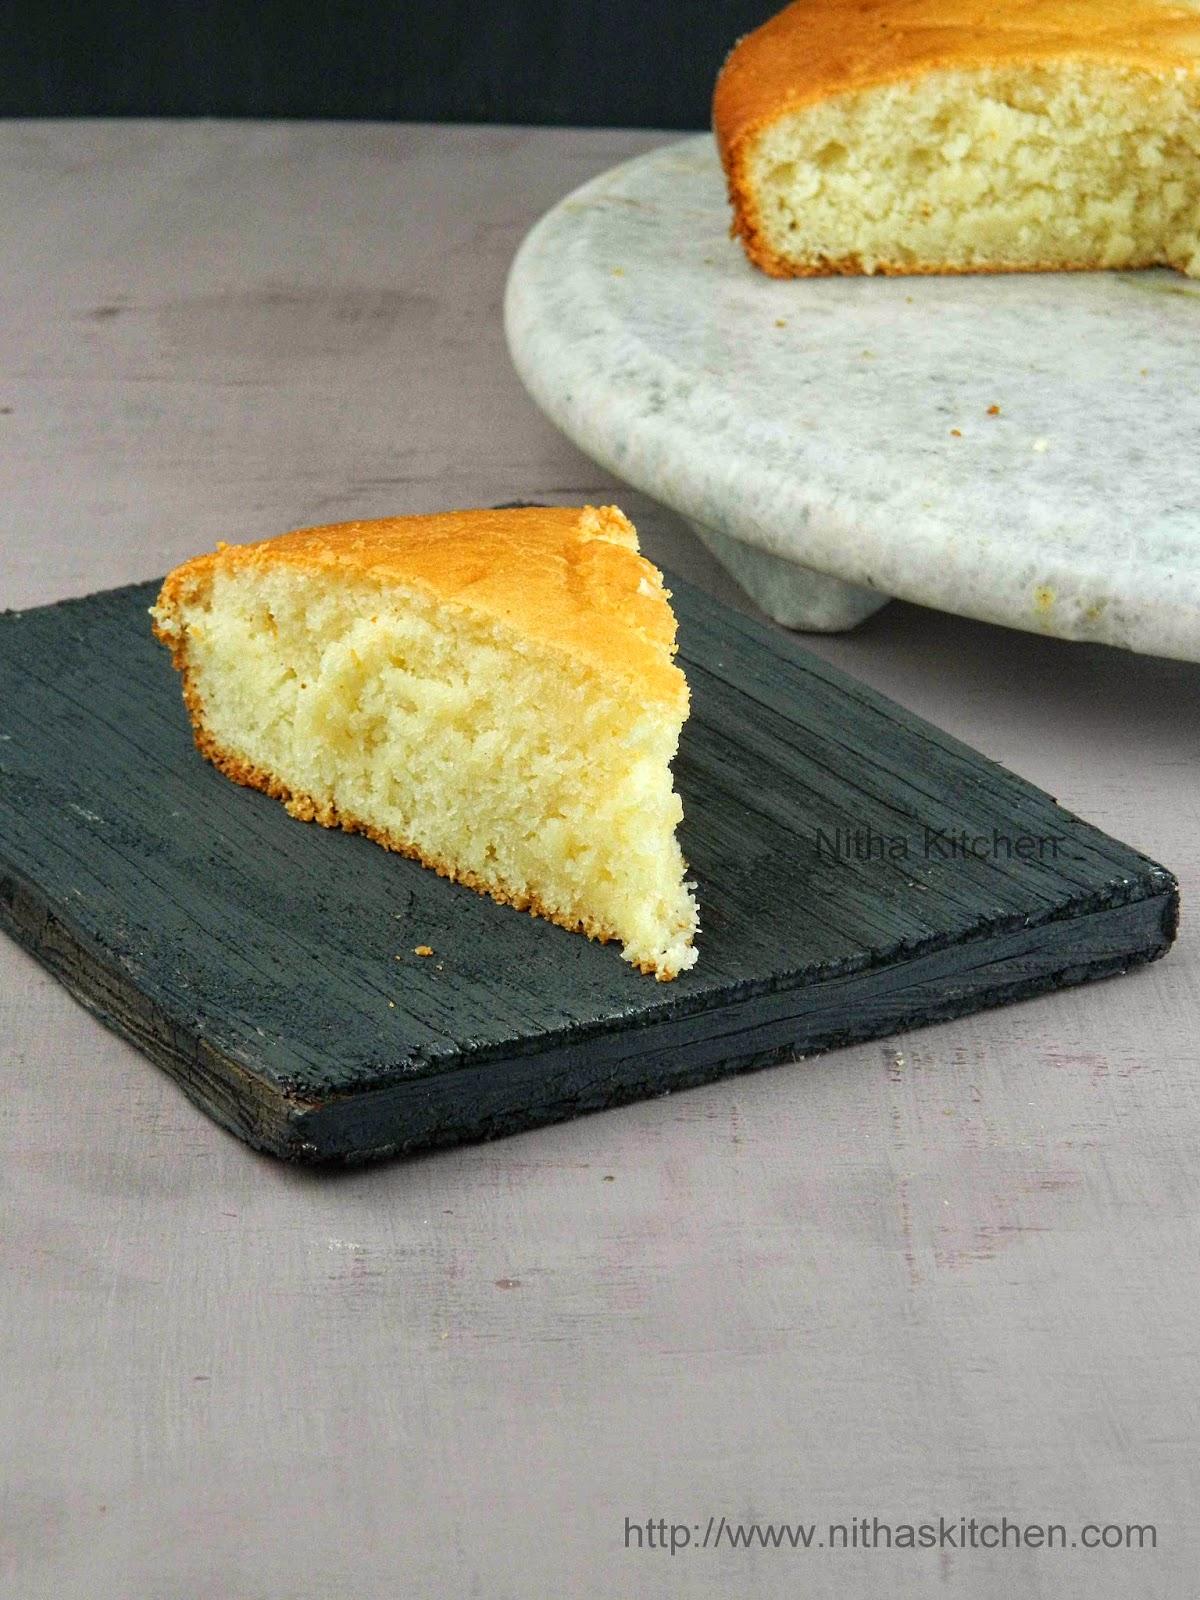 Eggless butterless vanilla sponge cake recipe nitha kitchen for Basic vanilla sponge